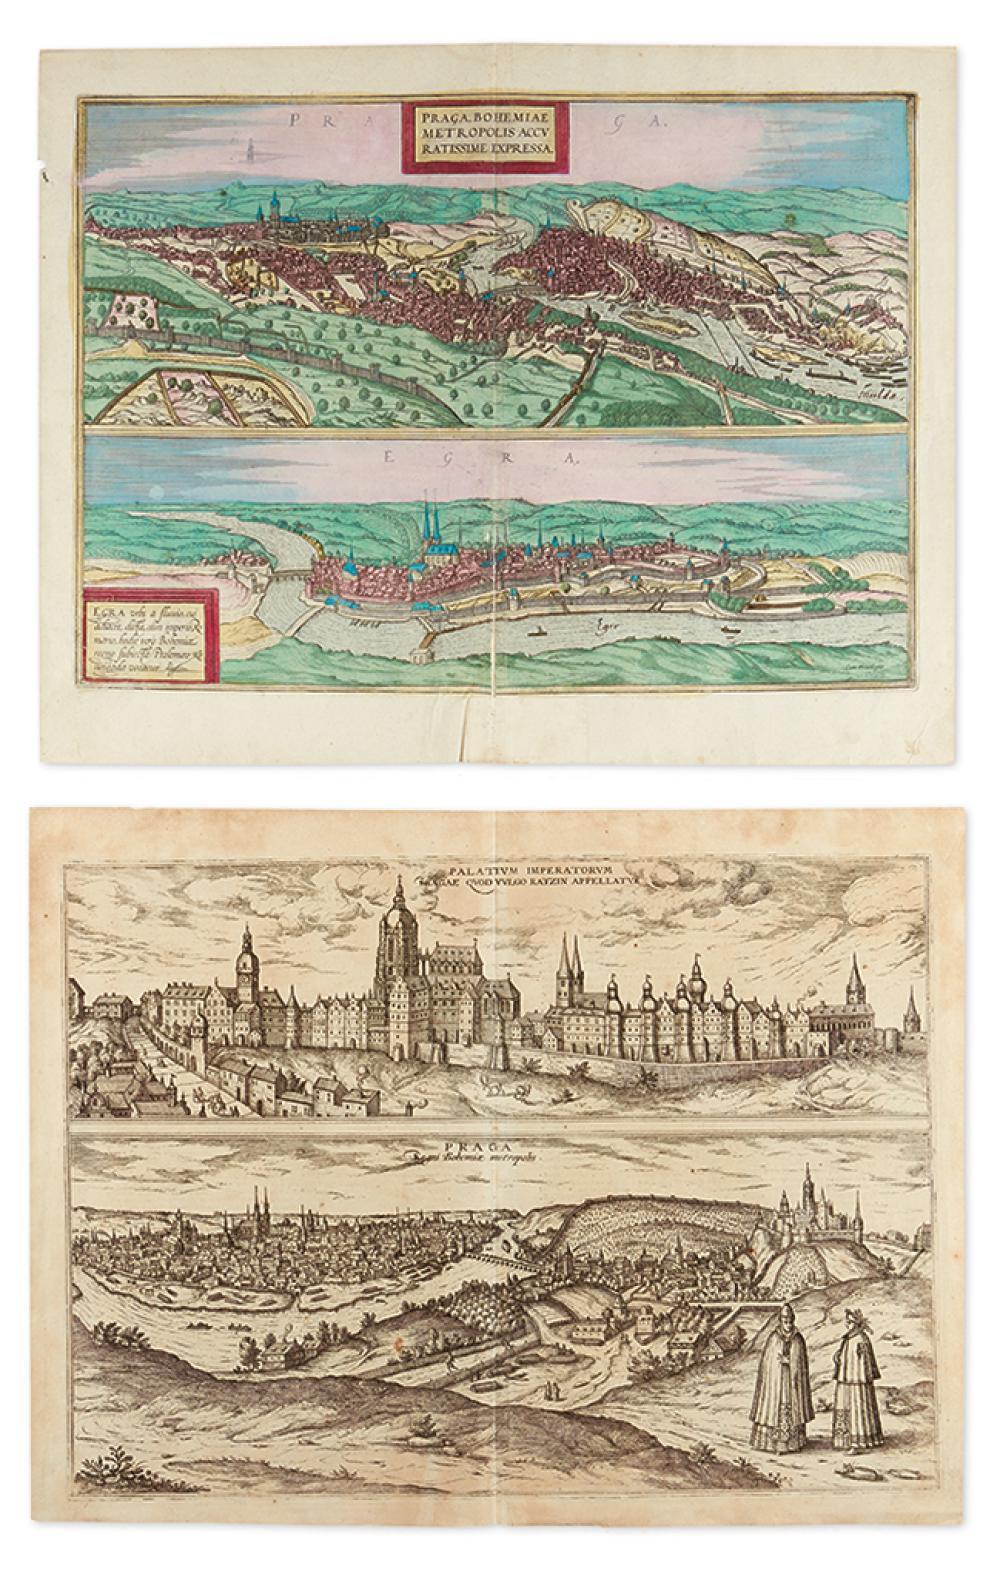 (PRAGUE.) Braun, Georg; and Hogenberg, Franz. Praga, Bohemiae Metropolis Accuratissime Expressa/Egra * Palatium Imperatorum Pragae/